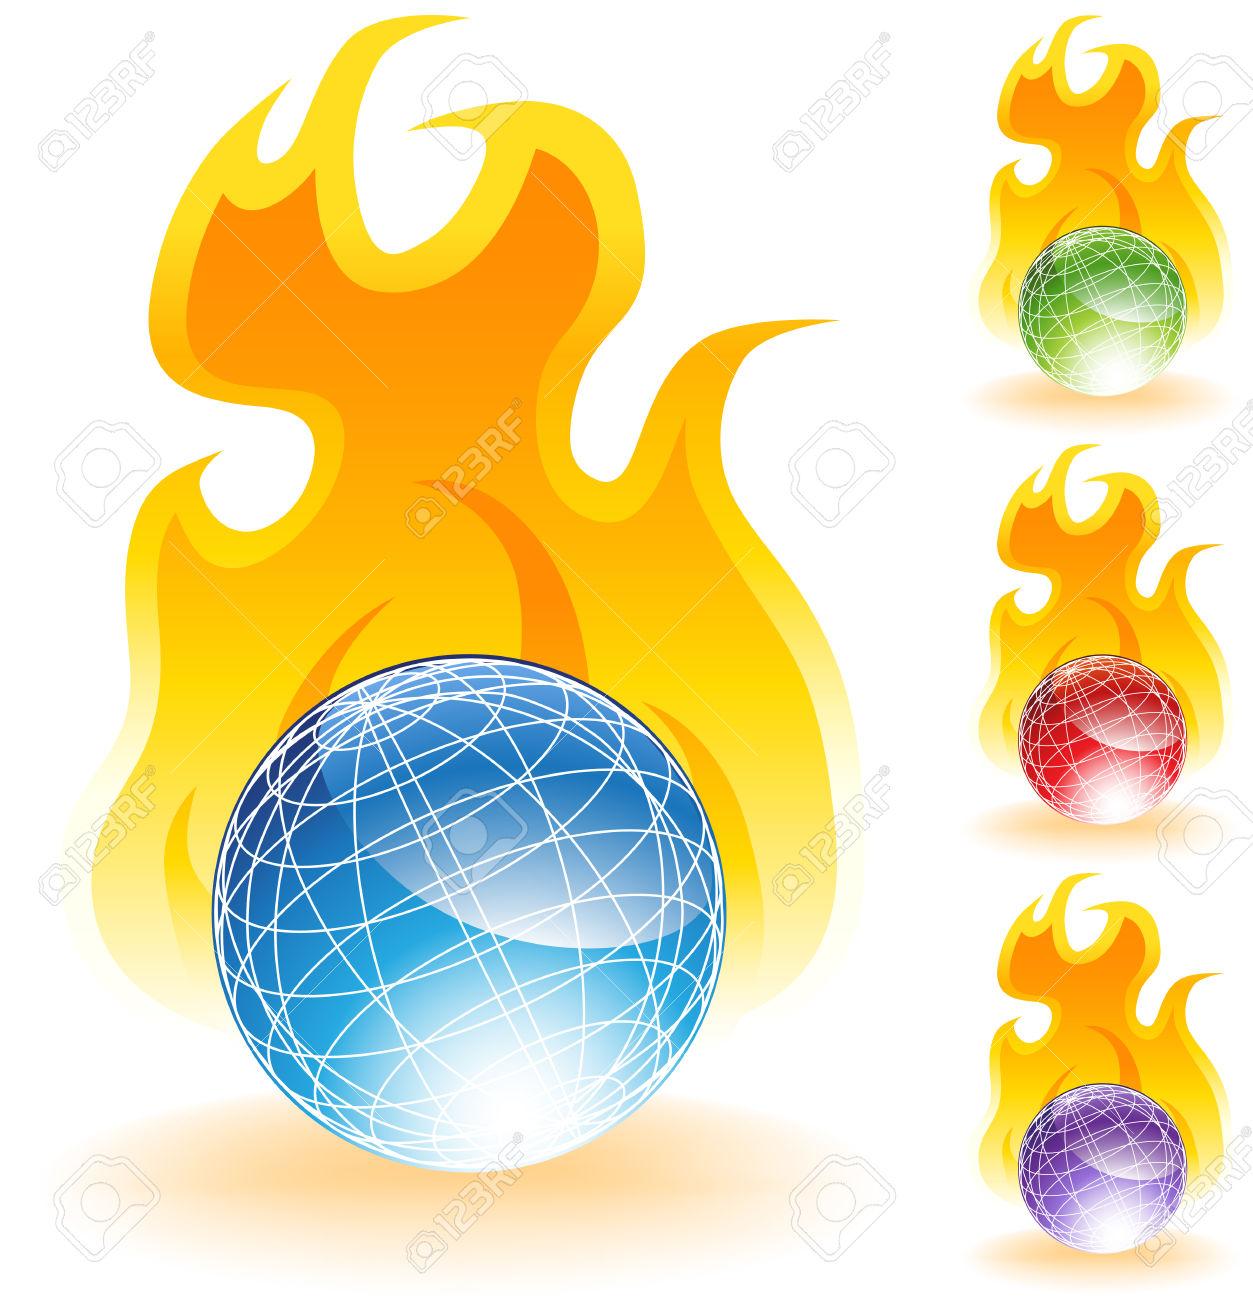 Burning World Royalty Free Cliparts, Vectors, And Stock.